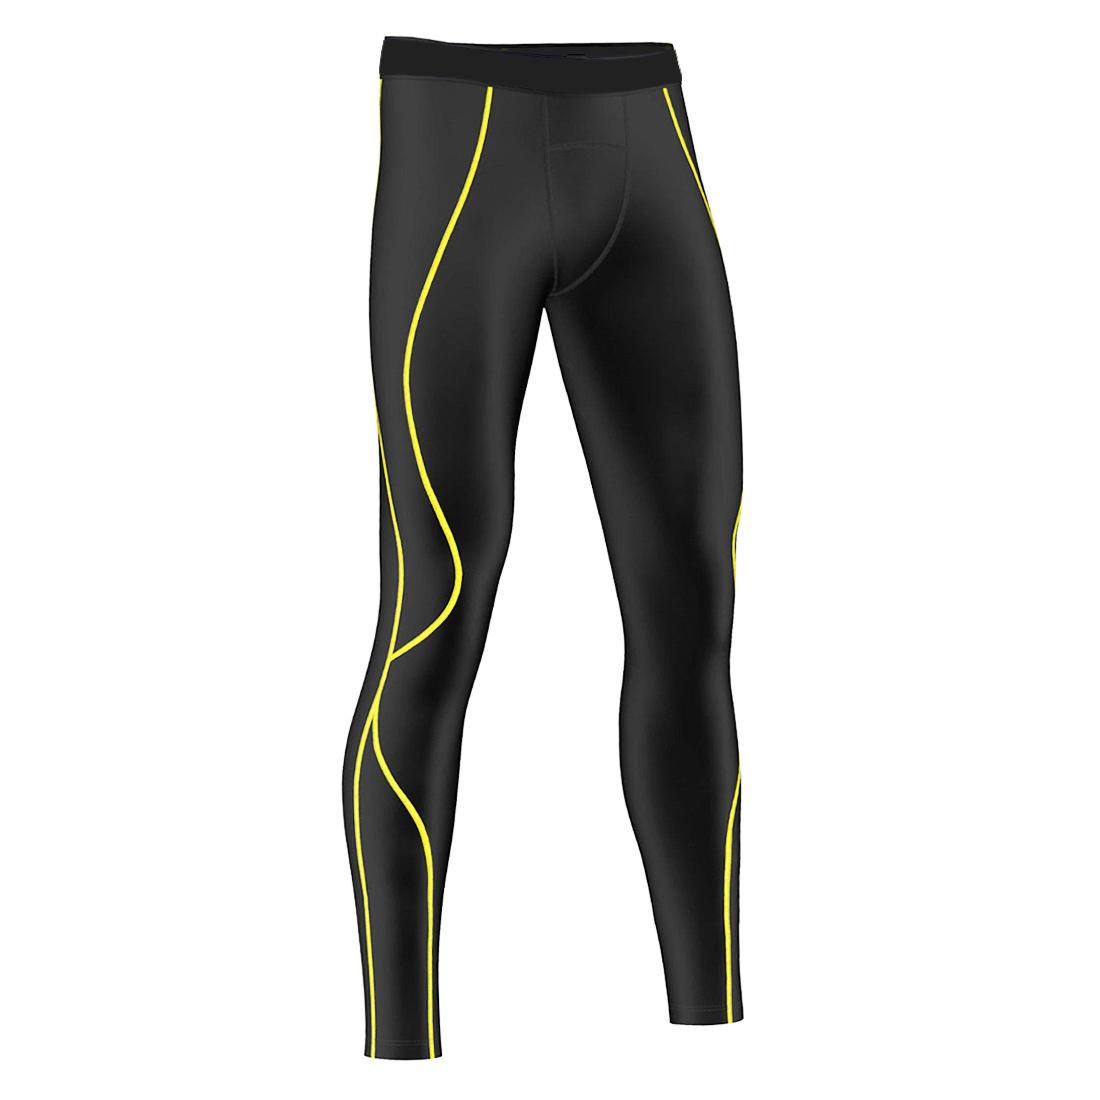 Men's Compression Shirts Pants Leggings Sports Exercise ...